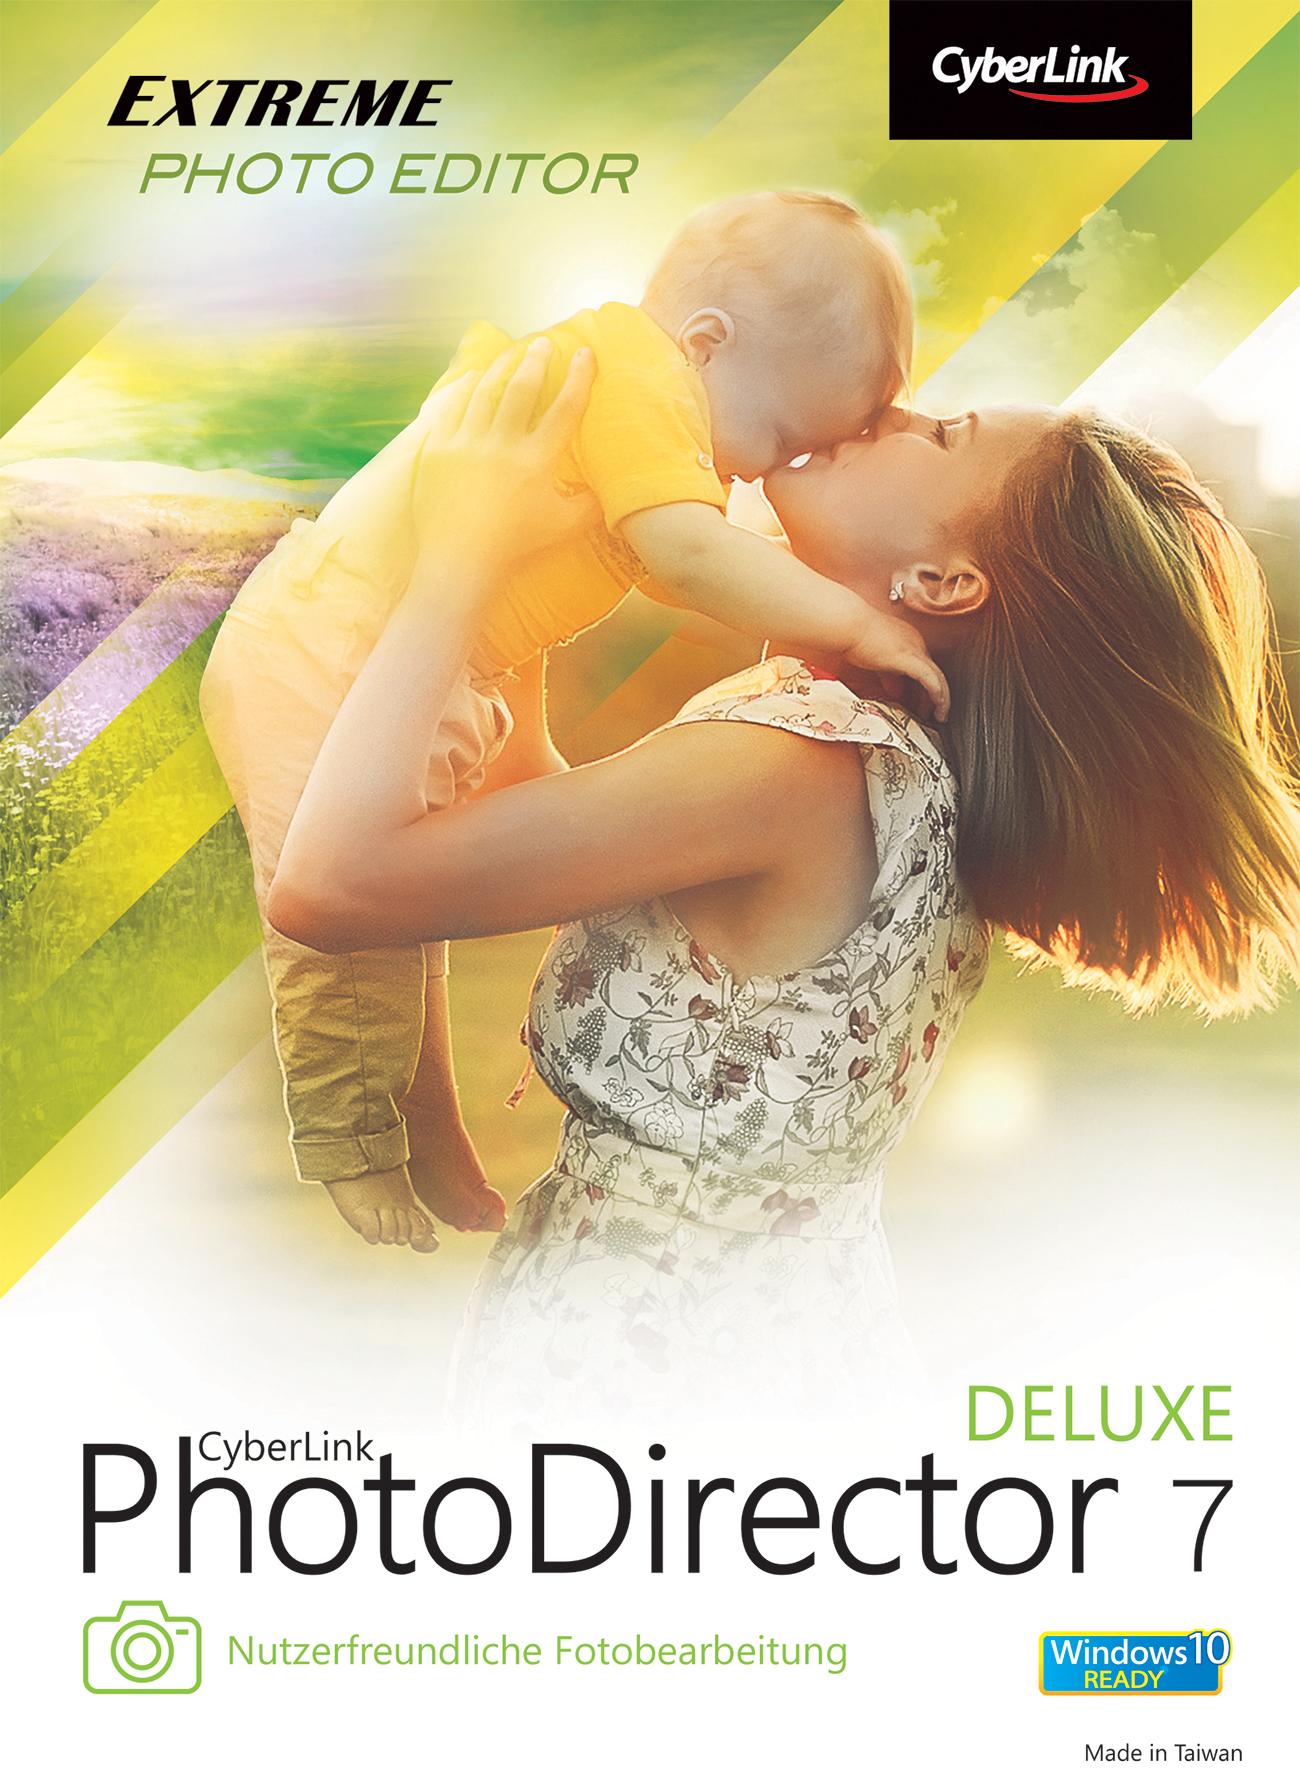 CyberLink Photodirector 7 Deluxe - Vollversion kostenlos